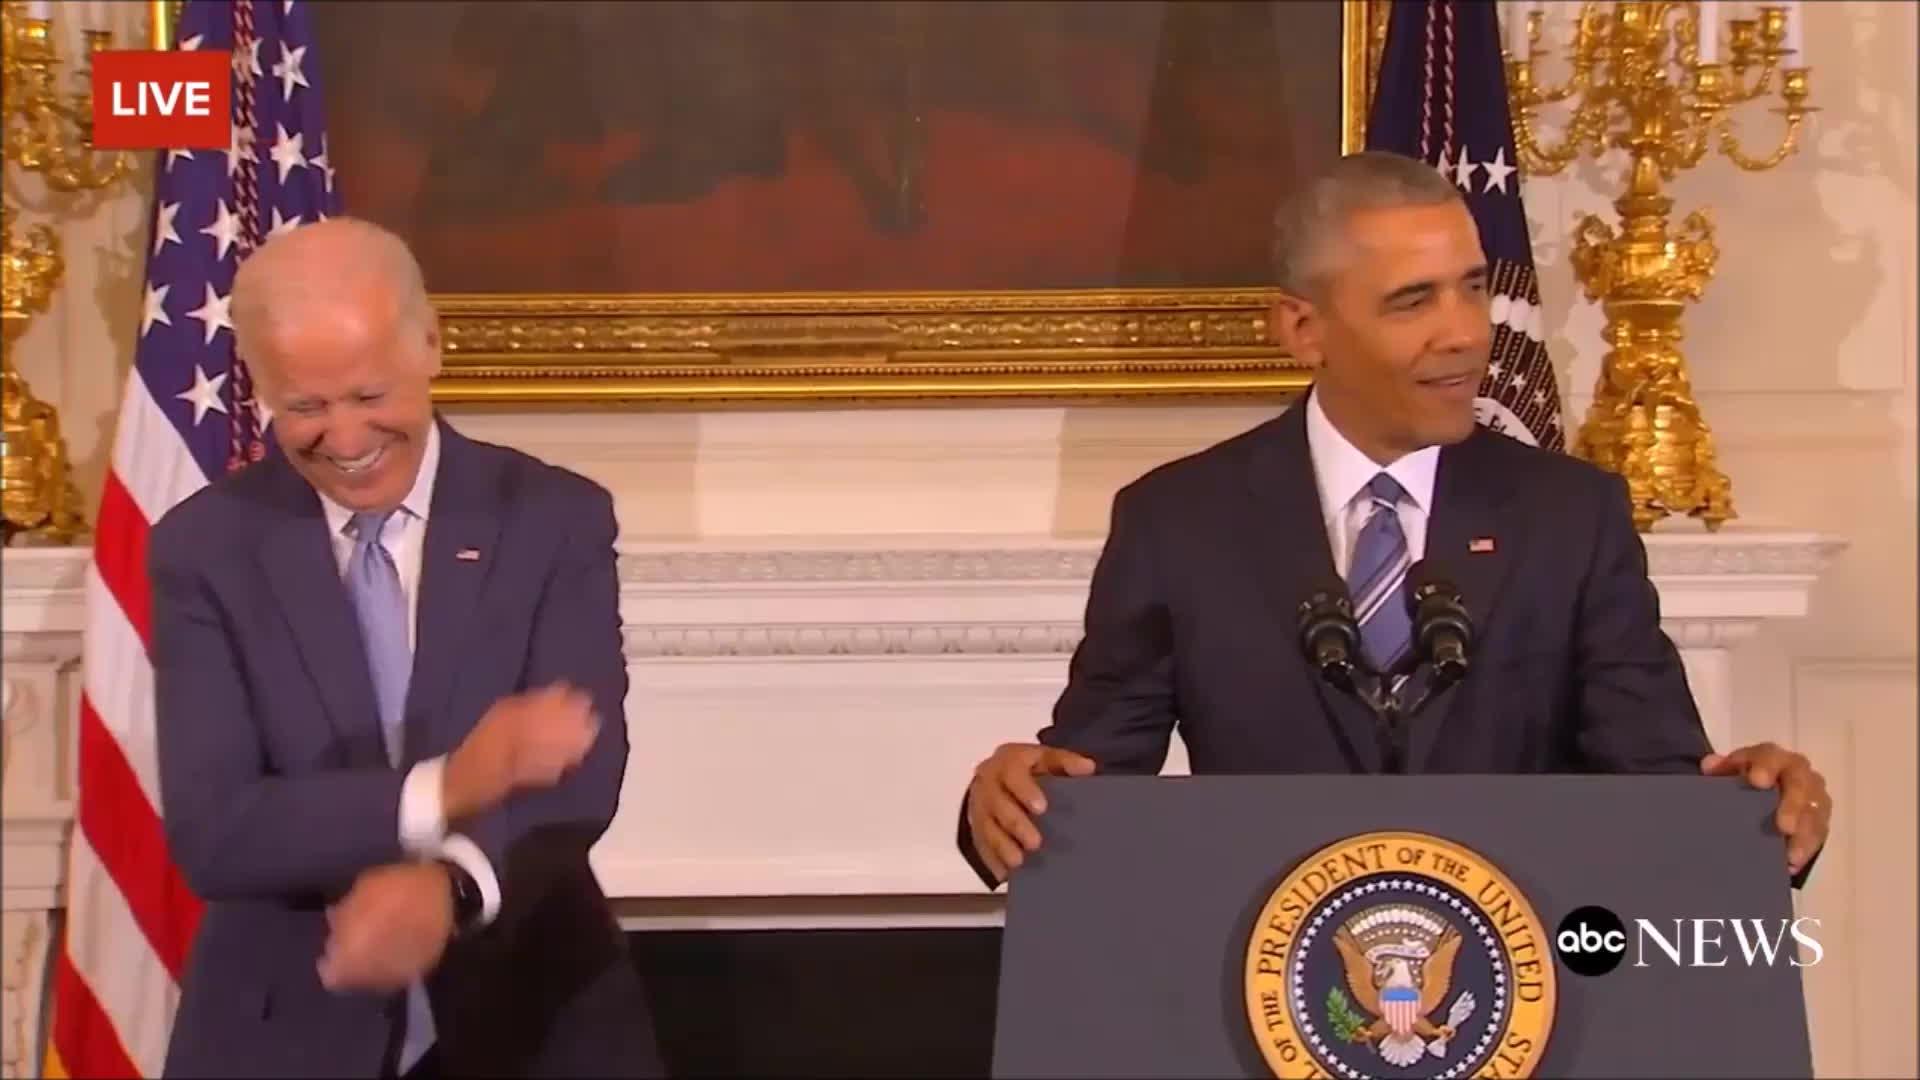 Barack Obama, JoeBiden, unclejoe, vicepresident, Joe Biden 2017 GIFs